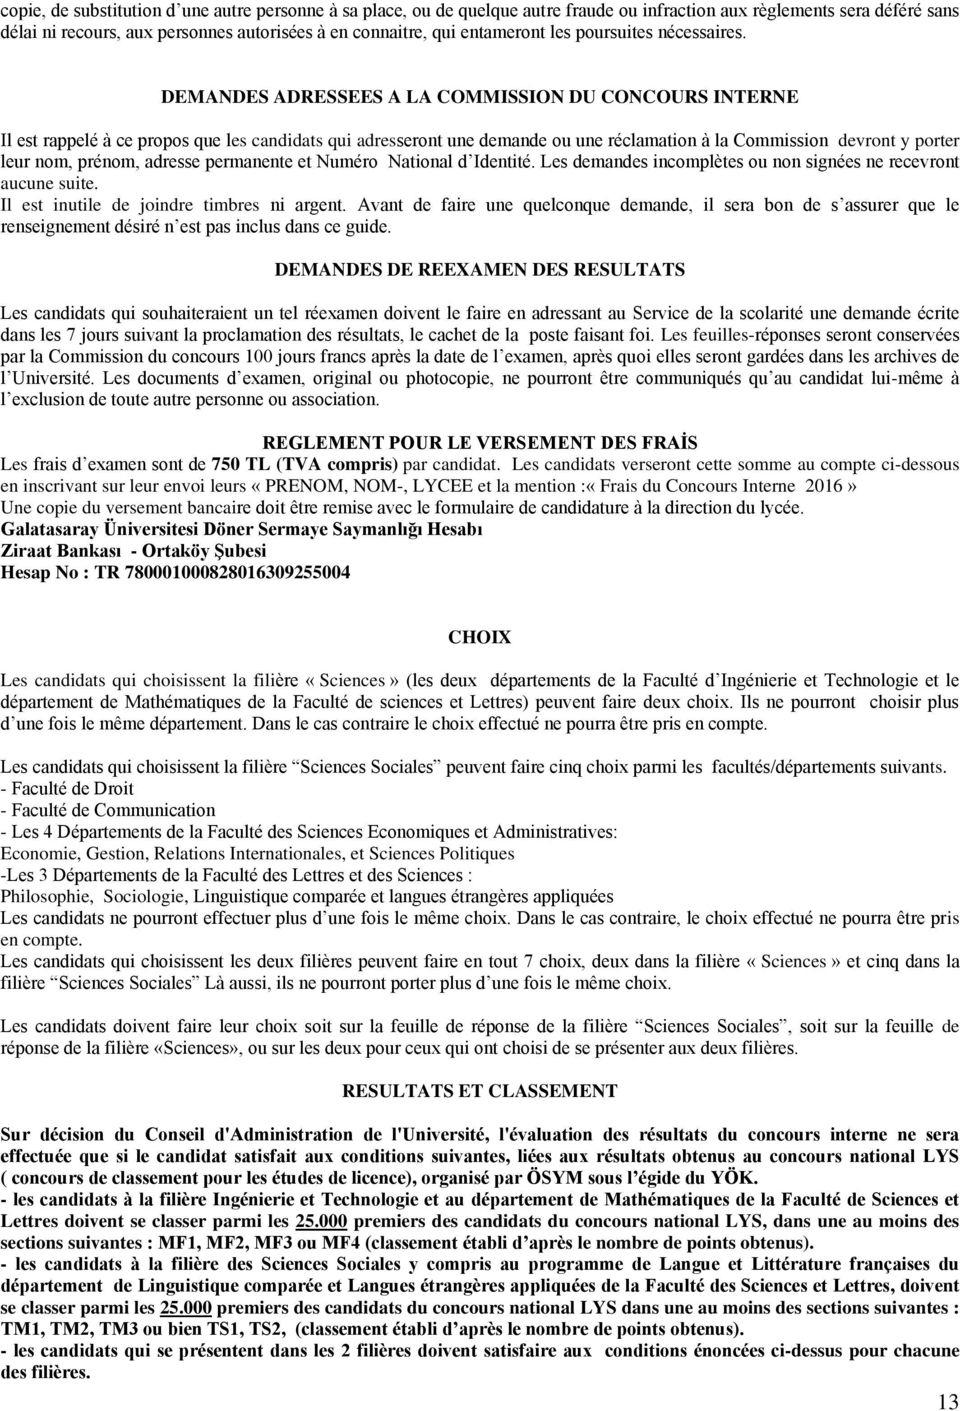 2016 Öğrenci Seçme Ve Yerleştirme Sinav Kilavuzu - Pdf Free avec Les Numéros Des Départements